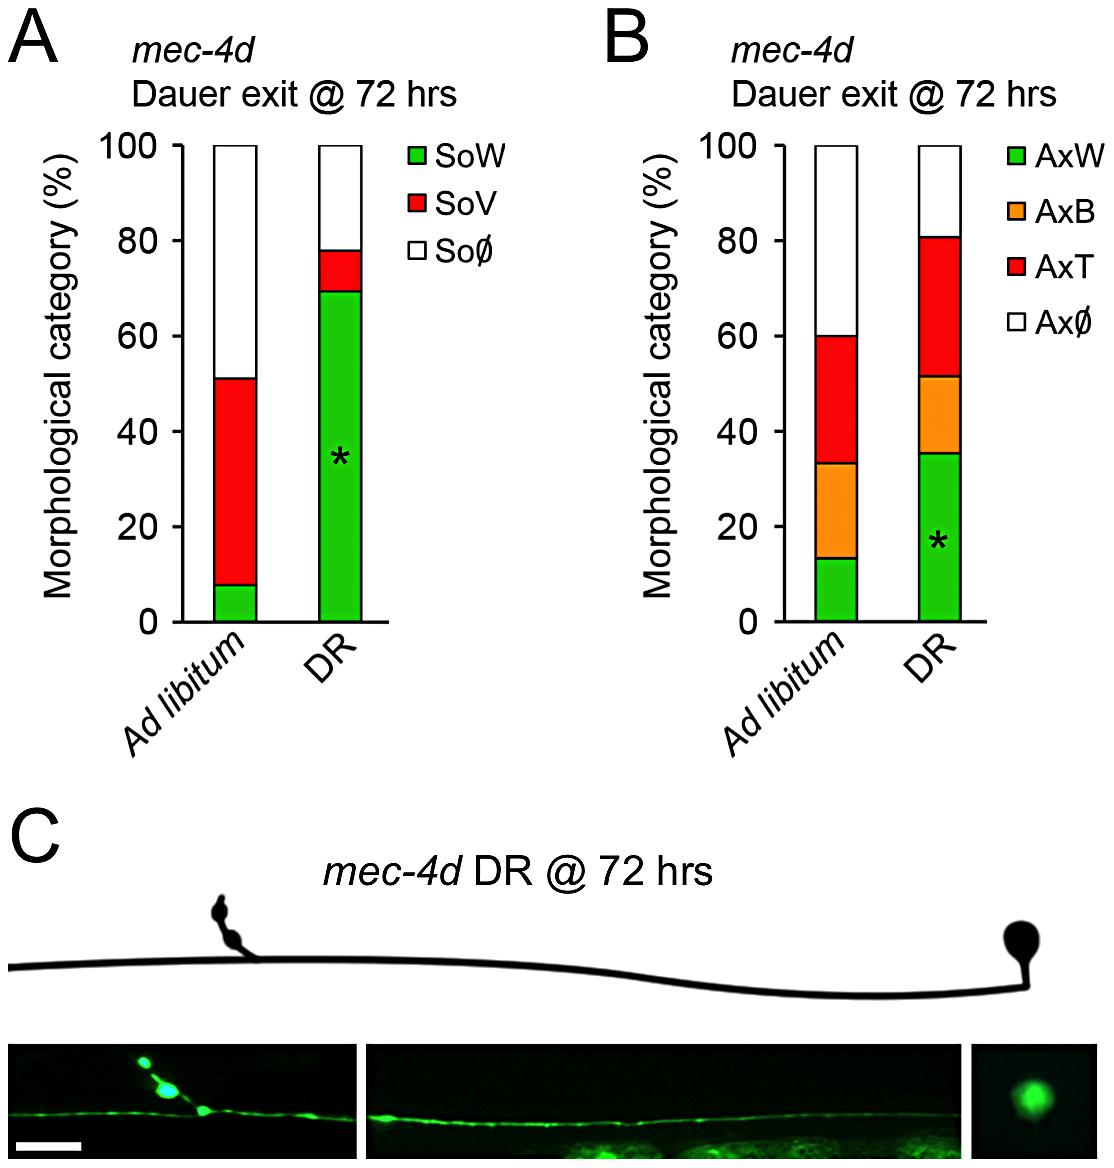 Dietary restriction inhibits <i>mec-4d</i>–dependent neuronal degeneration in <i>C. elegans</i>.